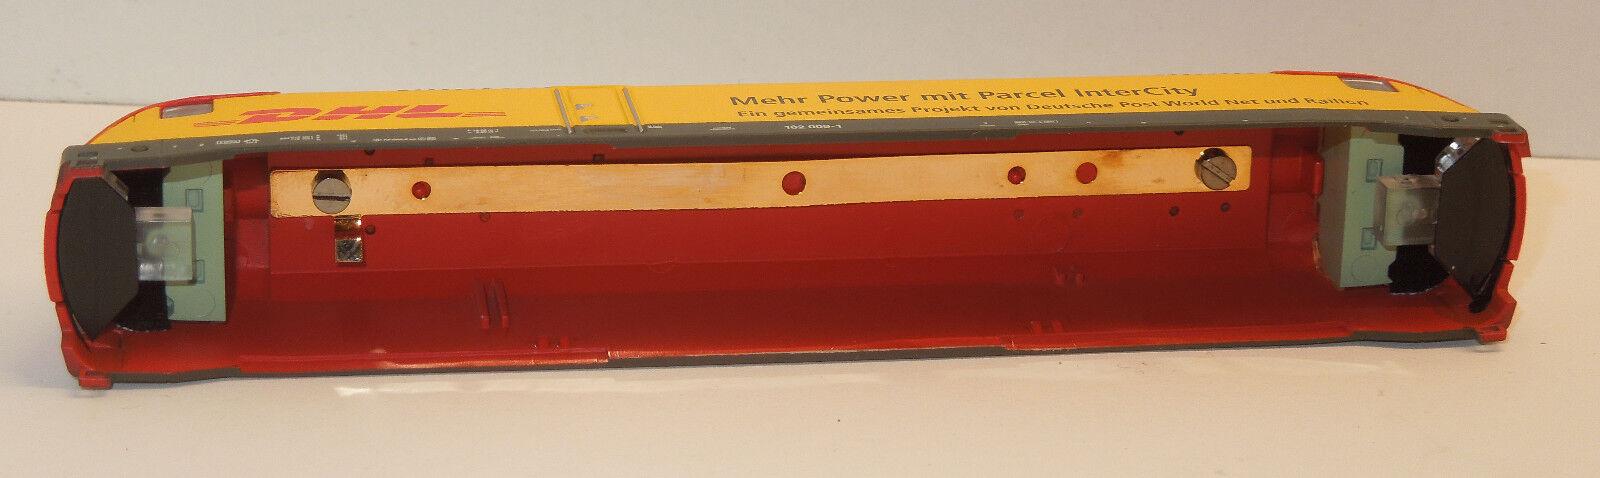 Minitrix Spur N für 12559 E-Lok E-Lok E-Lok BR 182 - komplettes Gehäuse DHL  | Tragen-wider  3b328c